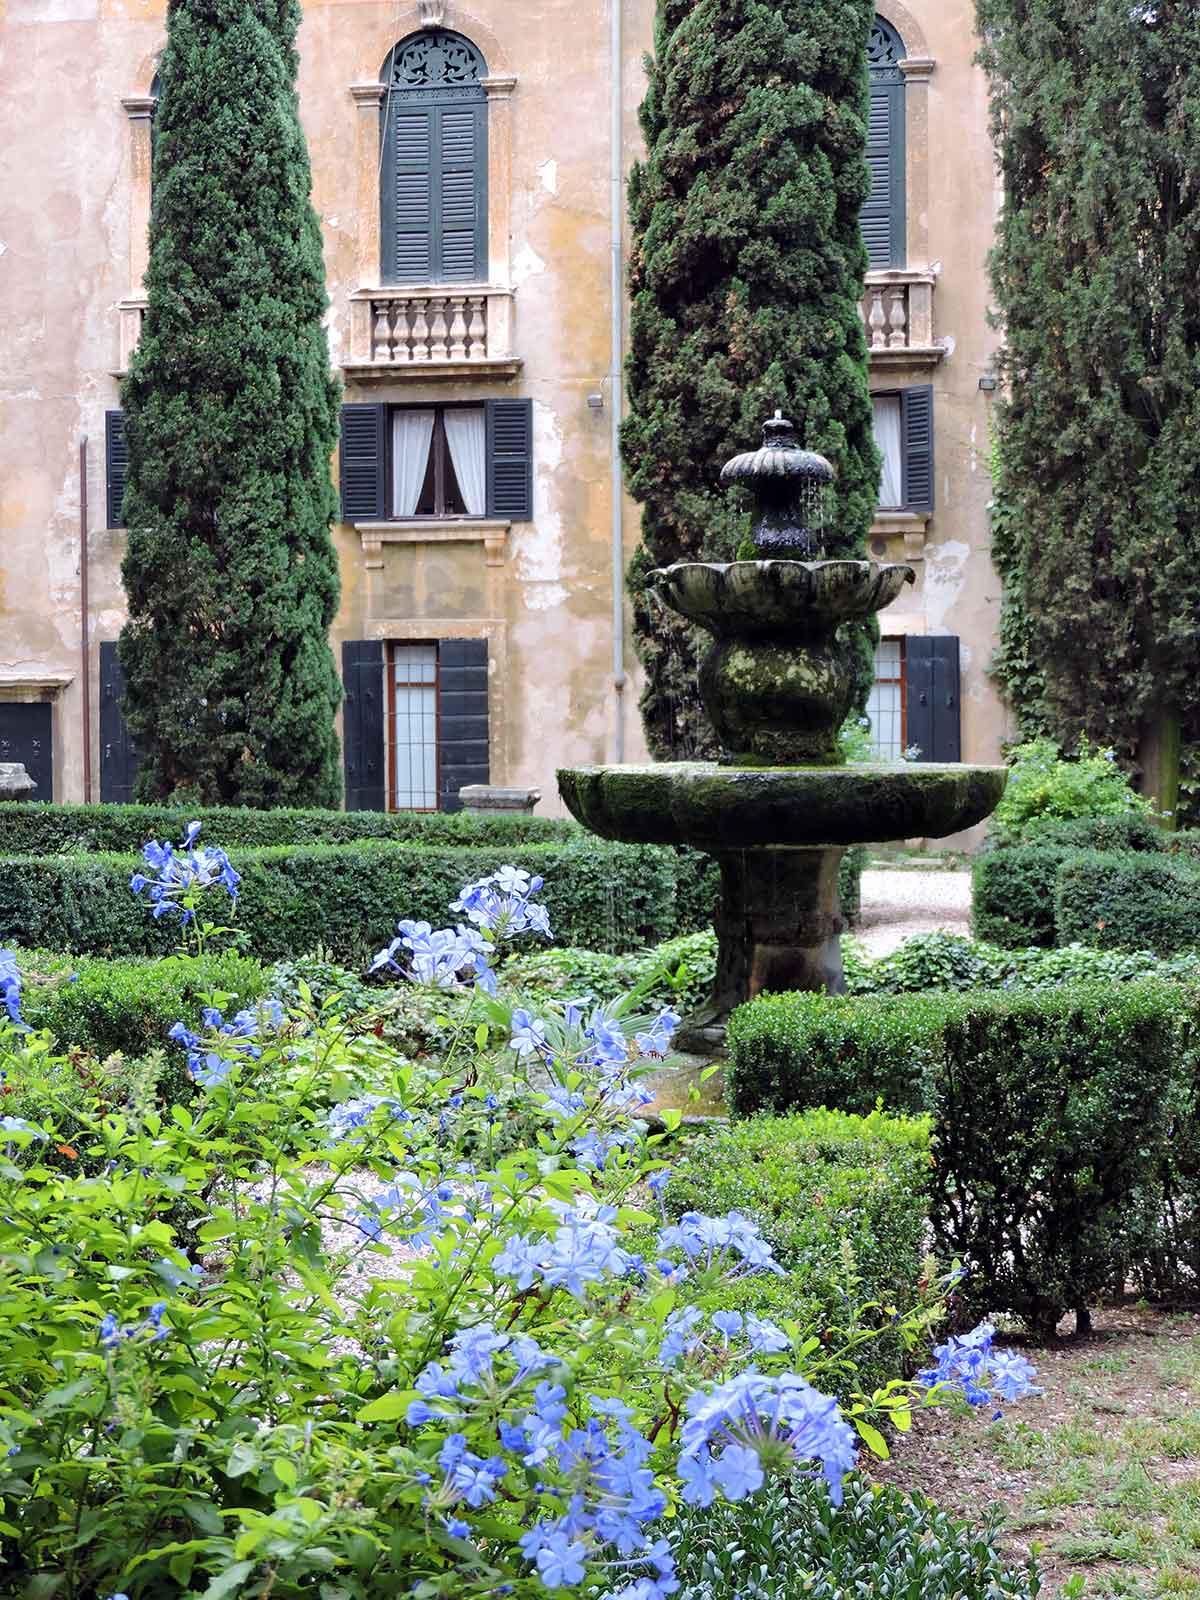 Giardino Giusti fountain in Verona, Italy